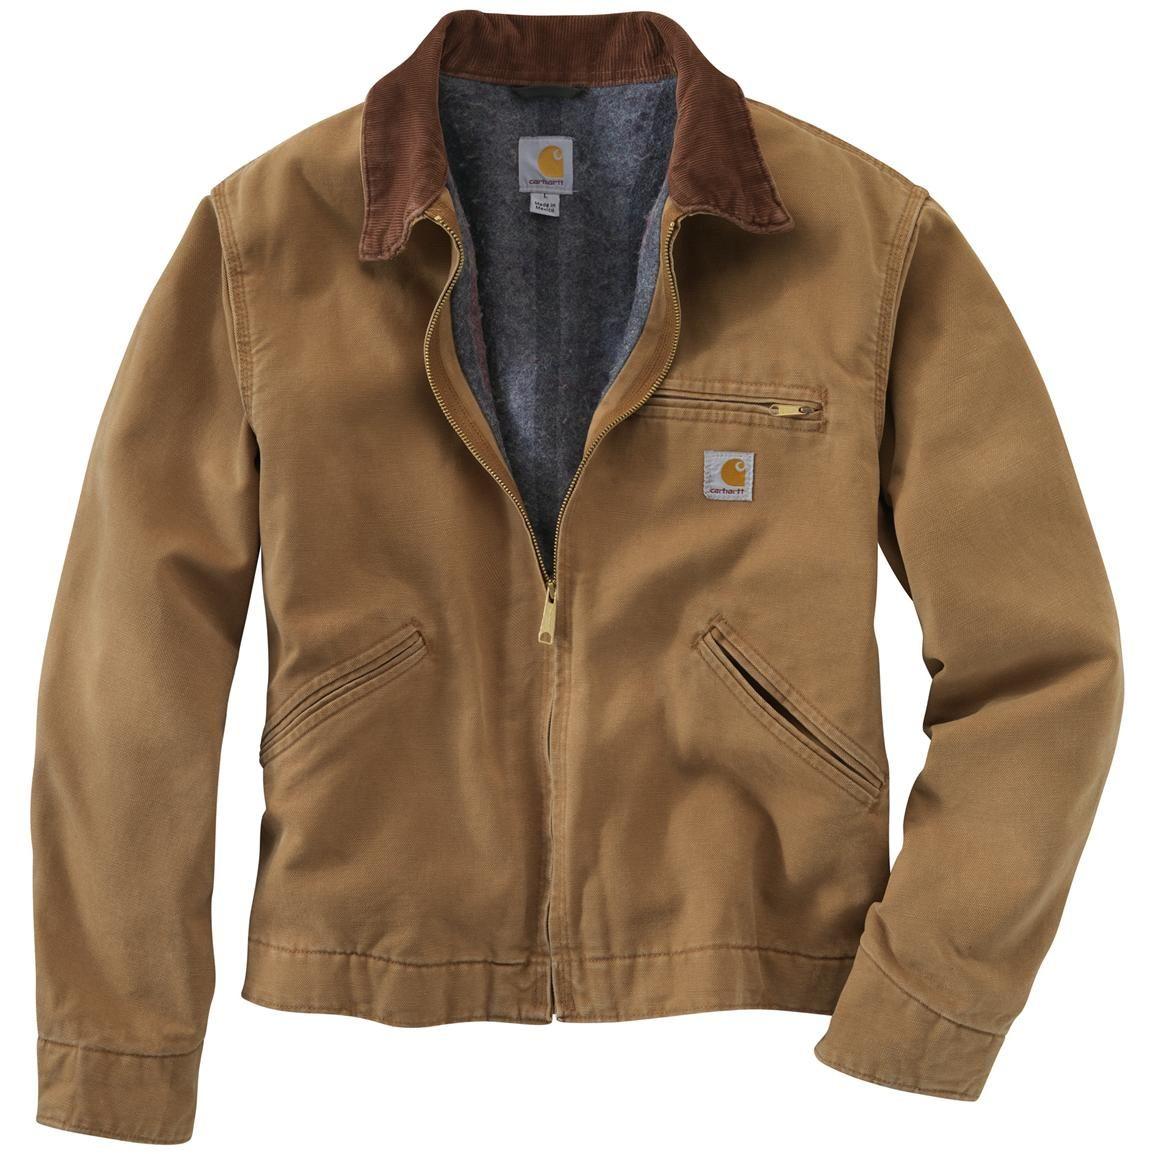 96981ba78bbcd Carhartt® Weathered Duck Detroit Jacket - the All-American work jacket worn  by Matthew McConaughey in #Interstellar!